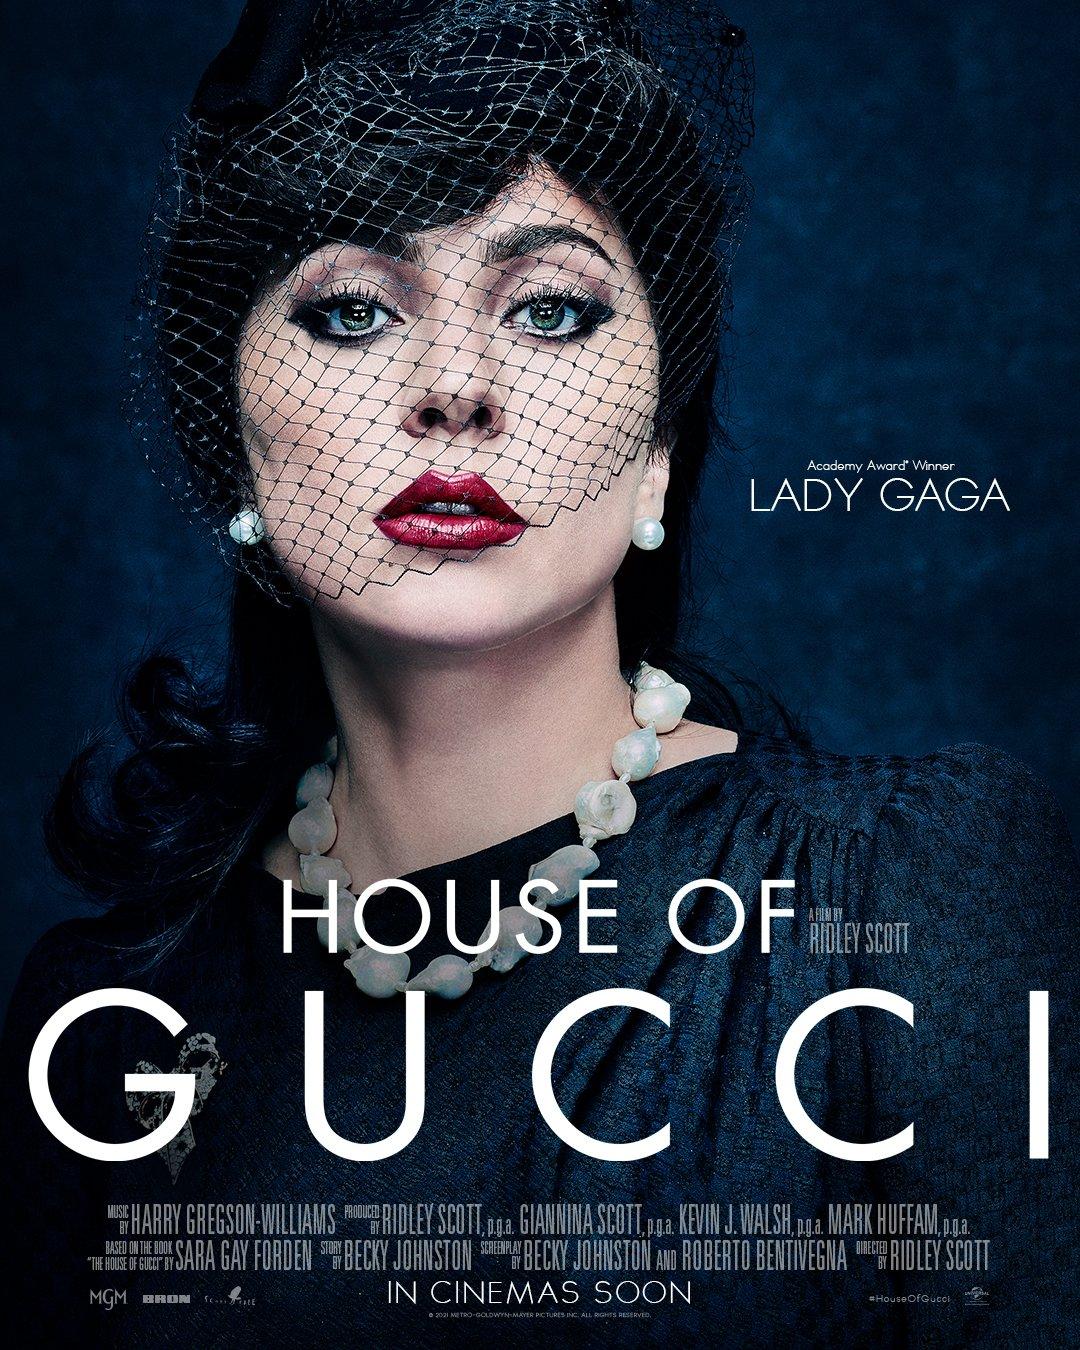 House of Gucci promo poster featuring Lady Gaga as Patrizia Regianni